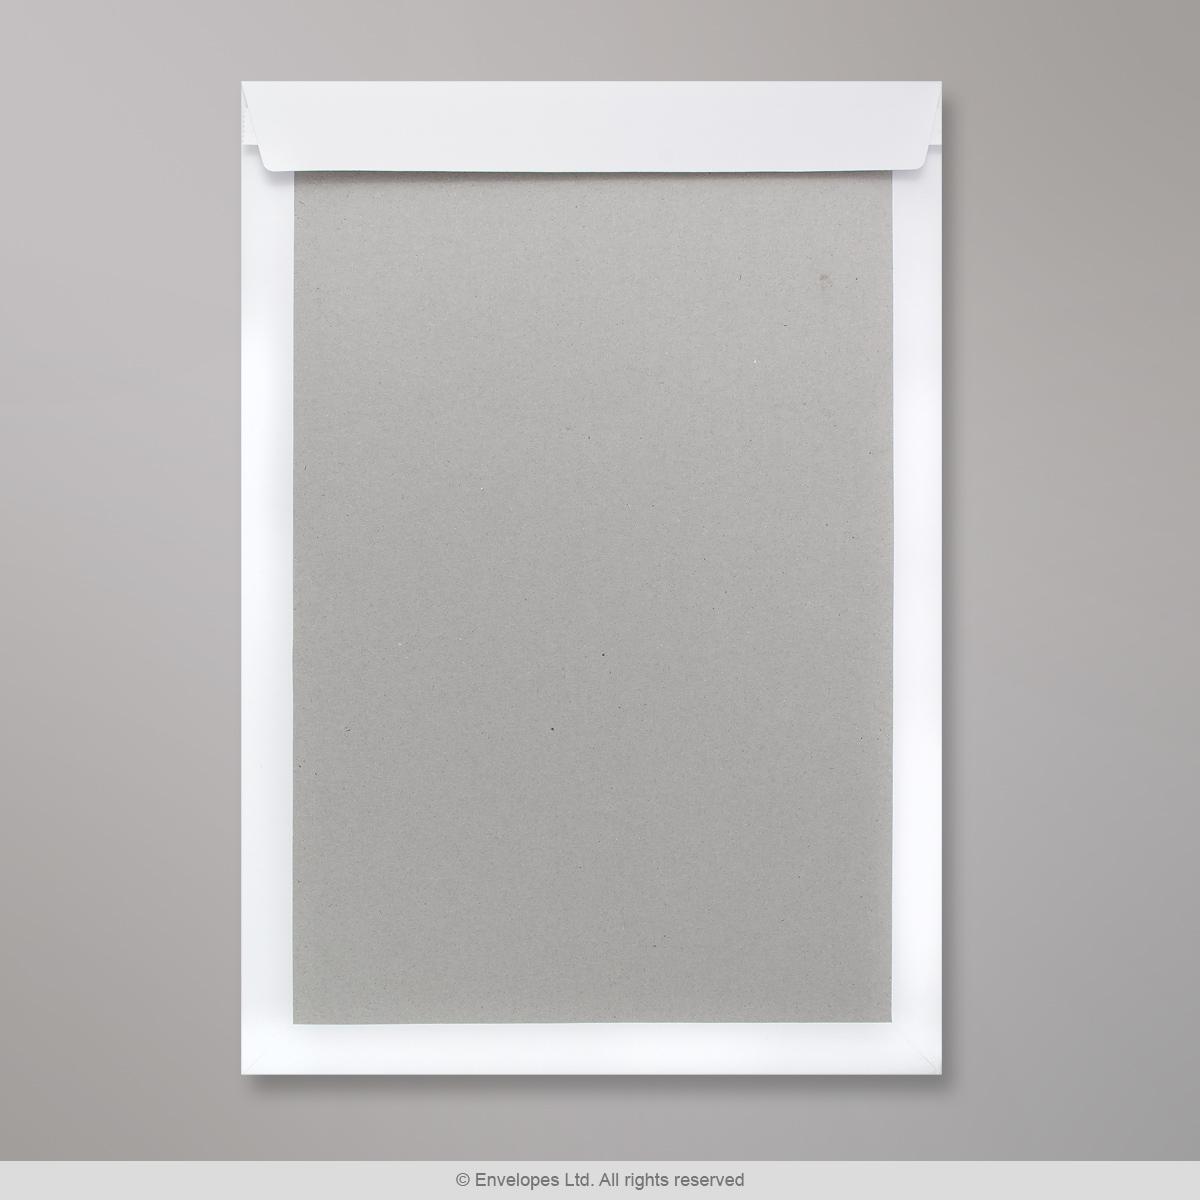 457x324 mm (C3) Busta con dorso rigido bianca